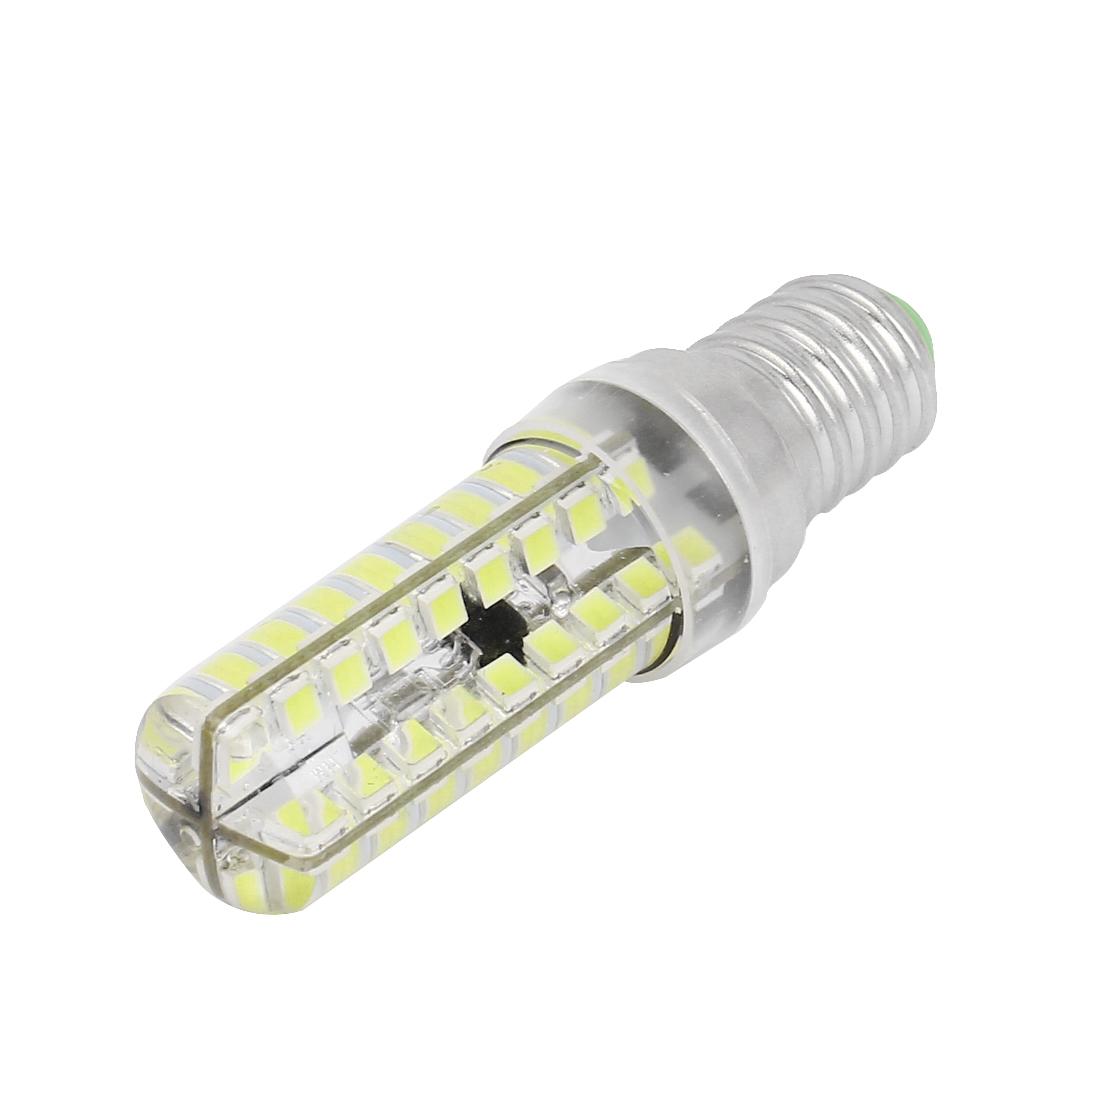 Dimming E14 7W 72 LED Lamp 2835 SMD Light Bulb Pure White AC 220V-240V